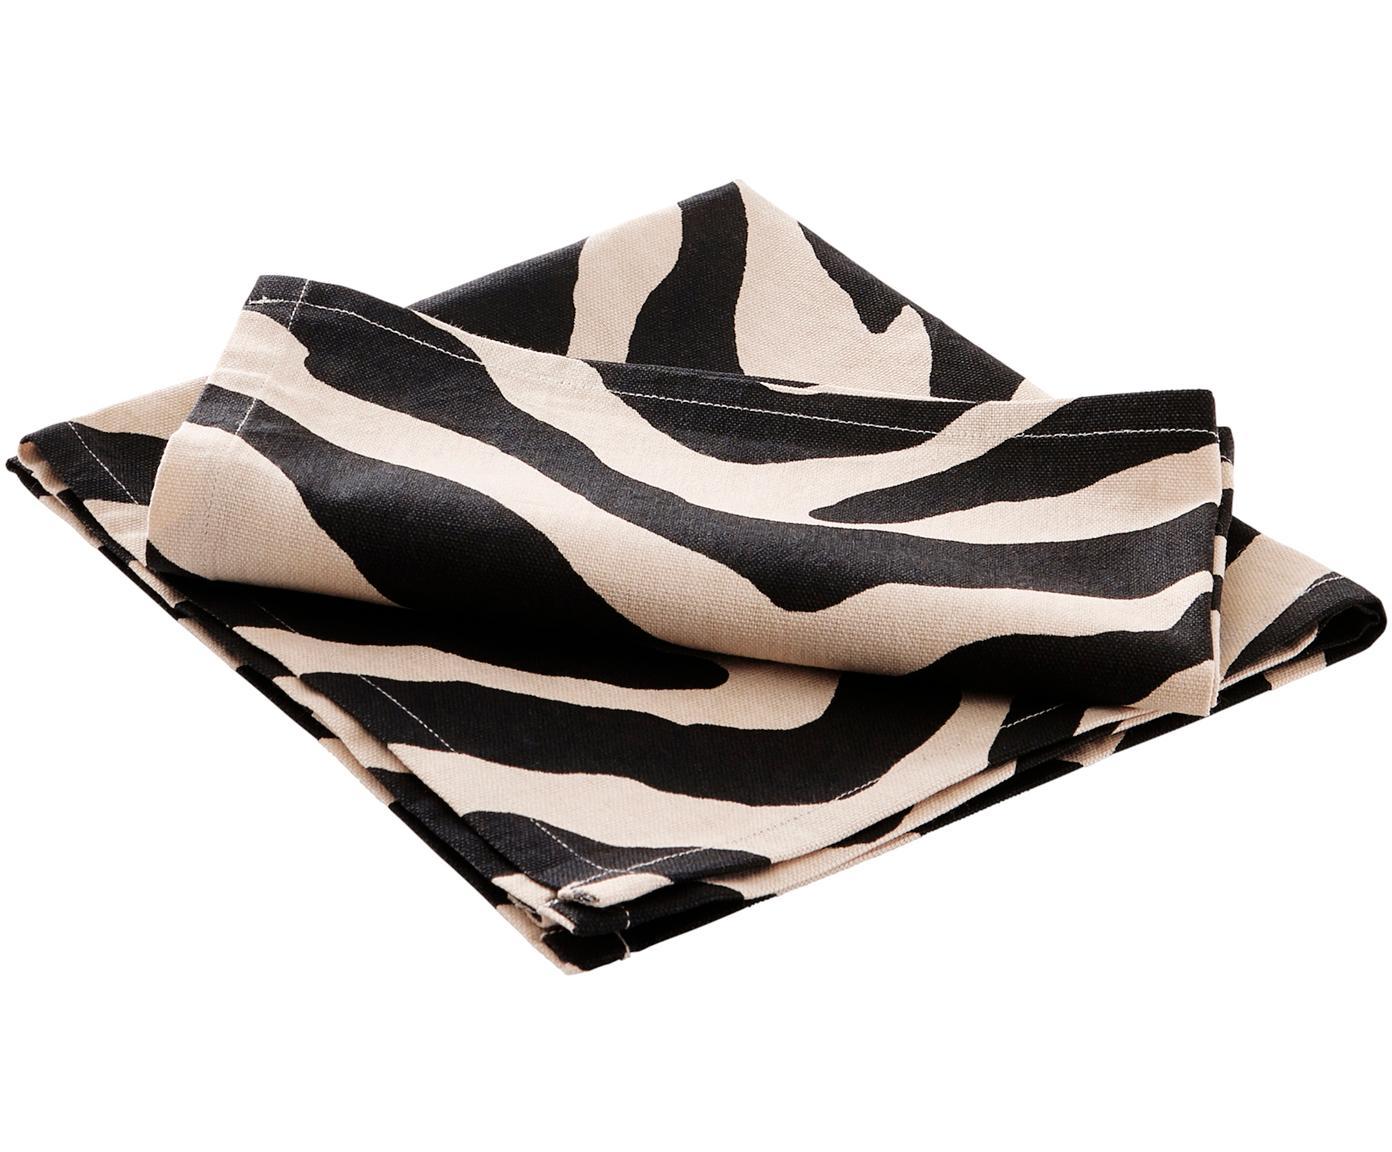 Katoenen servetten Zebra, 2 stuks, Katoen, Zwart, crèmekleurig, 45 x 45 cm